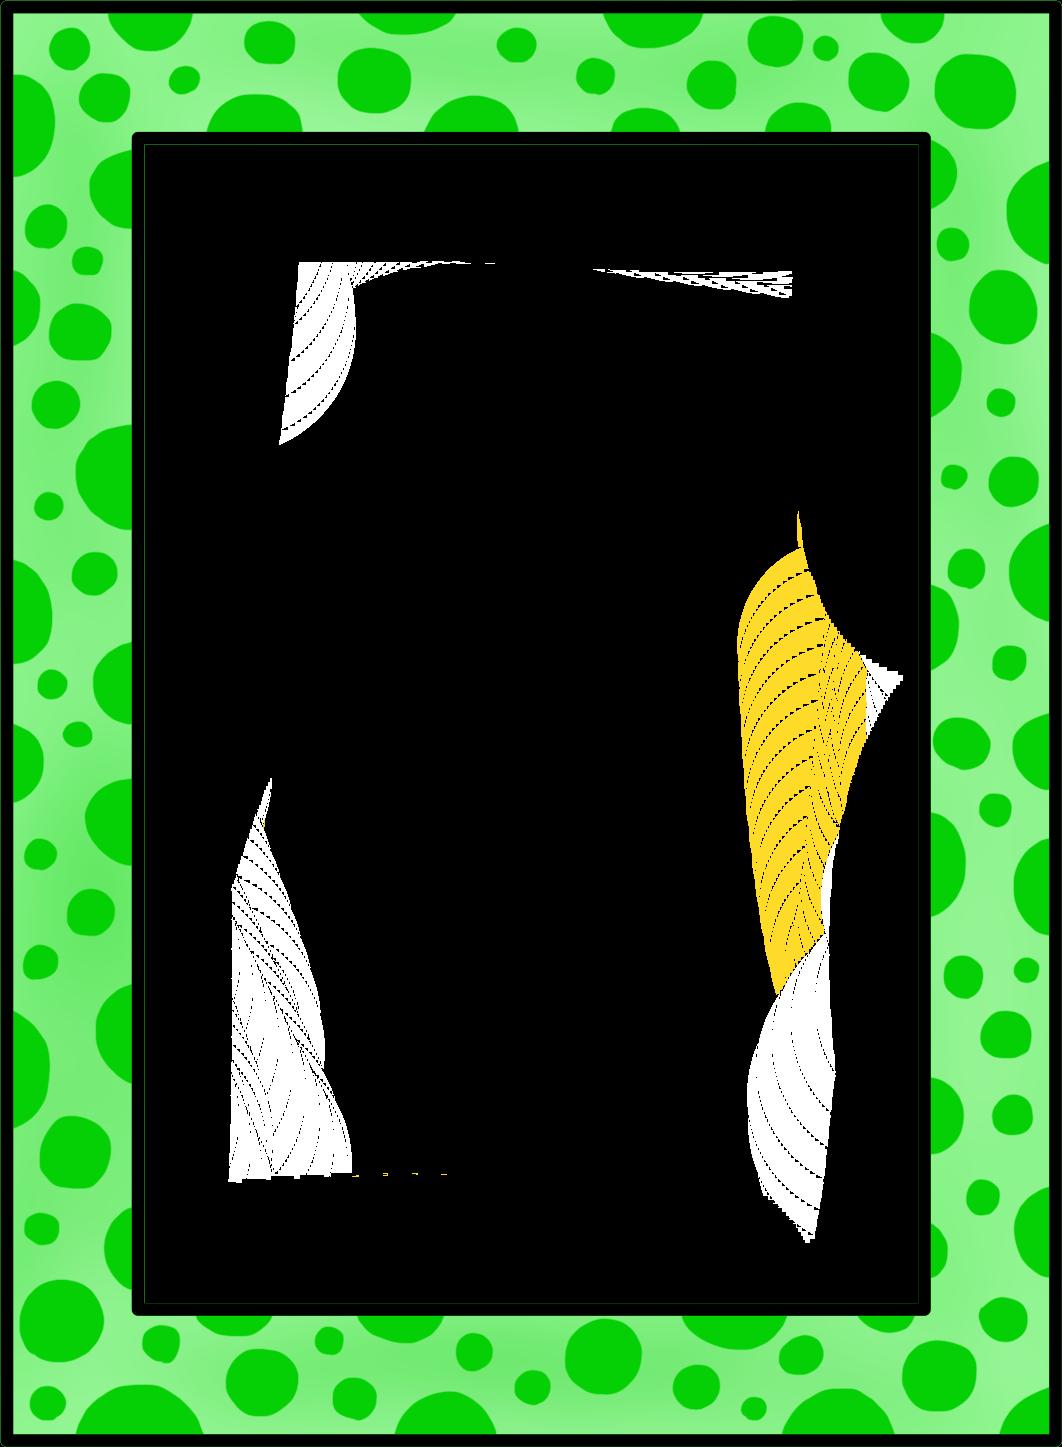 Polaroid paperclip